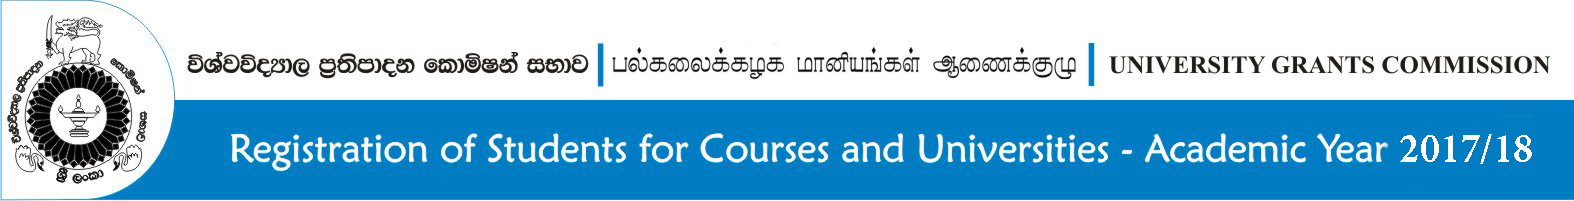 Student Registration for Universities